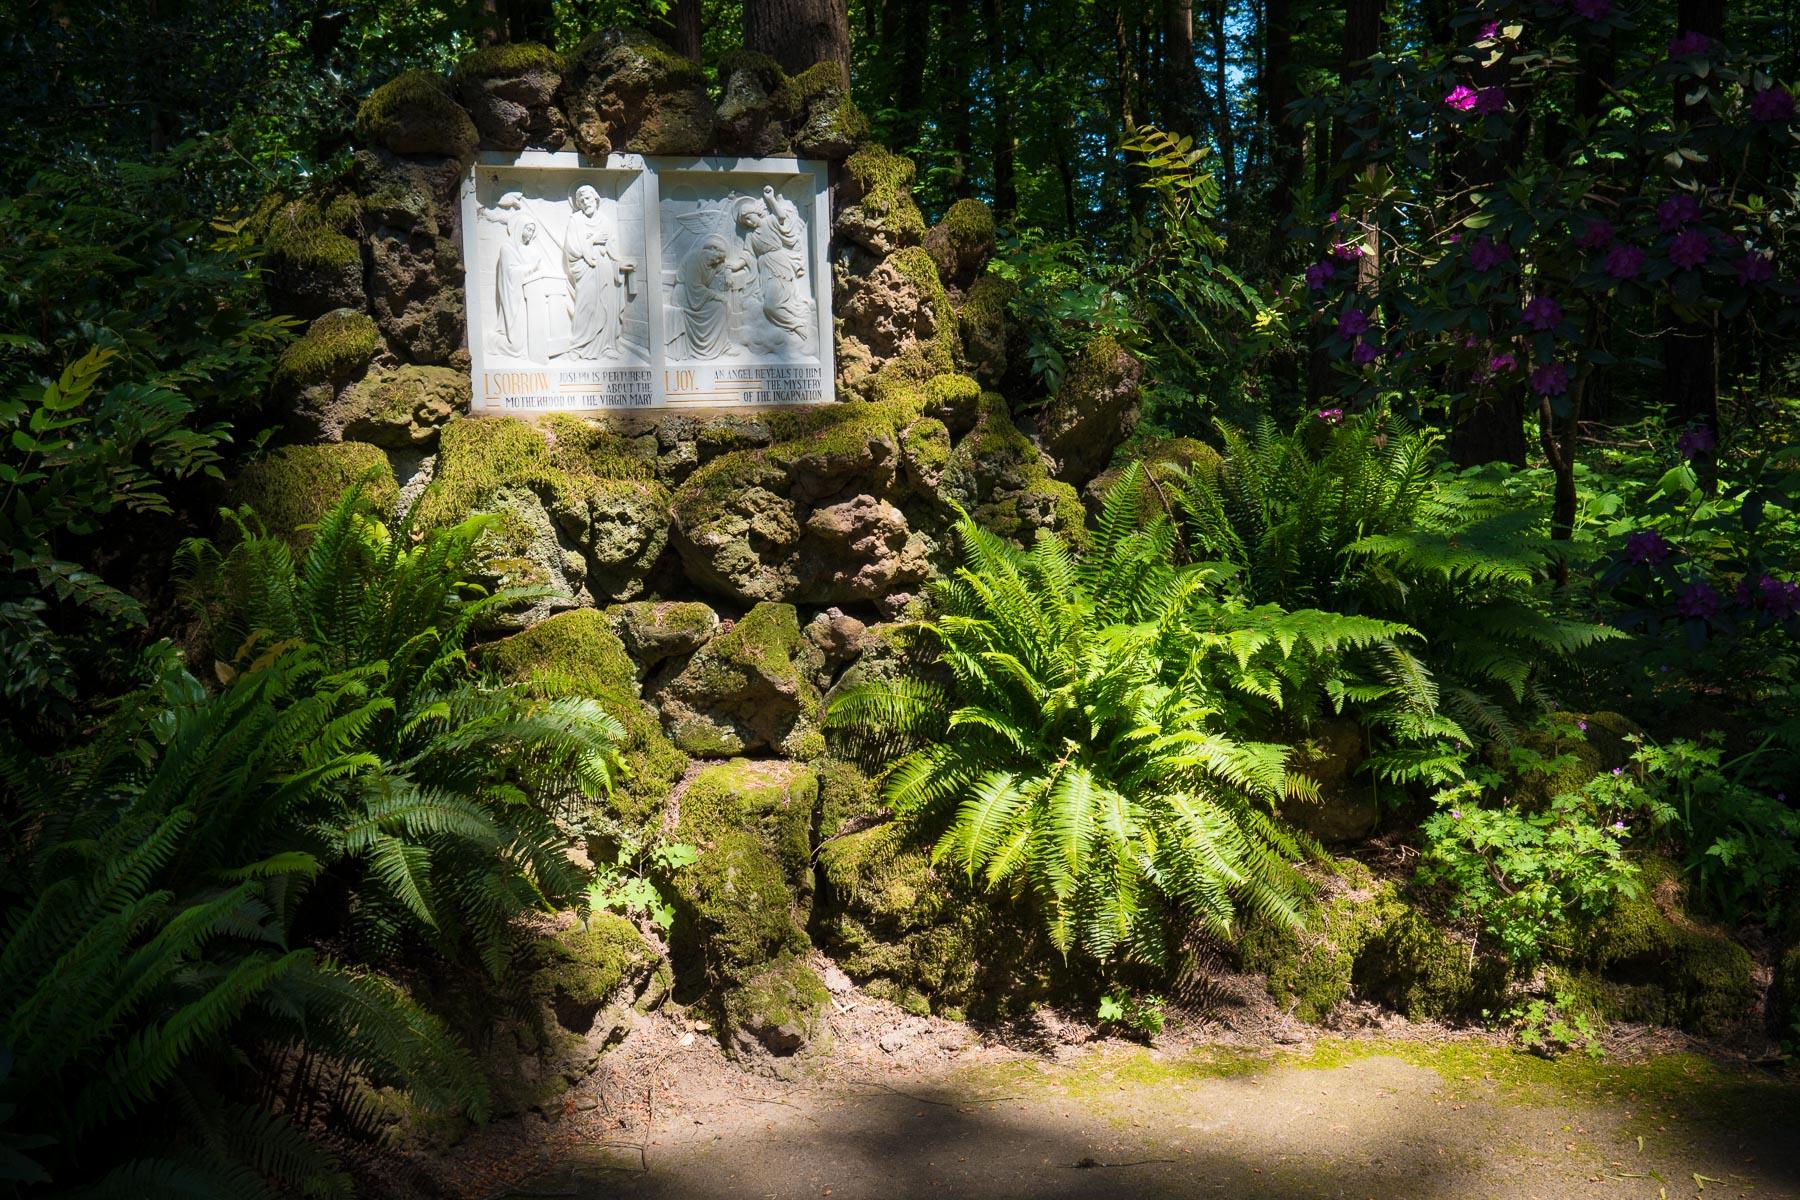 05-Trinity Grotto web-8.jpg